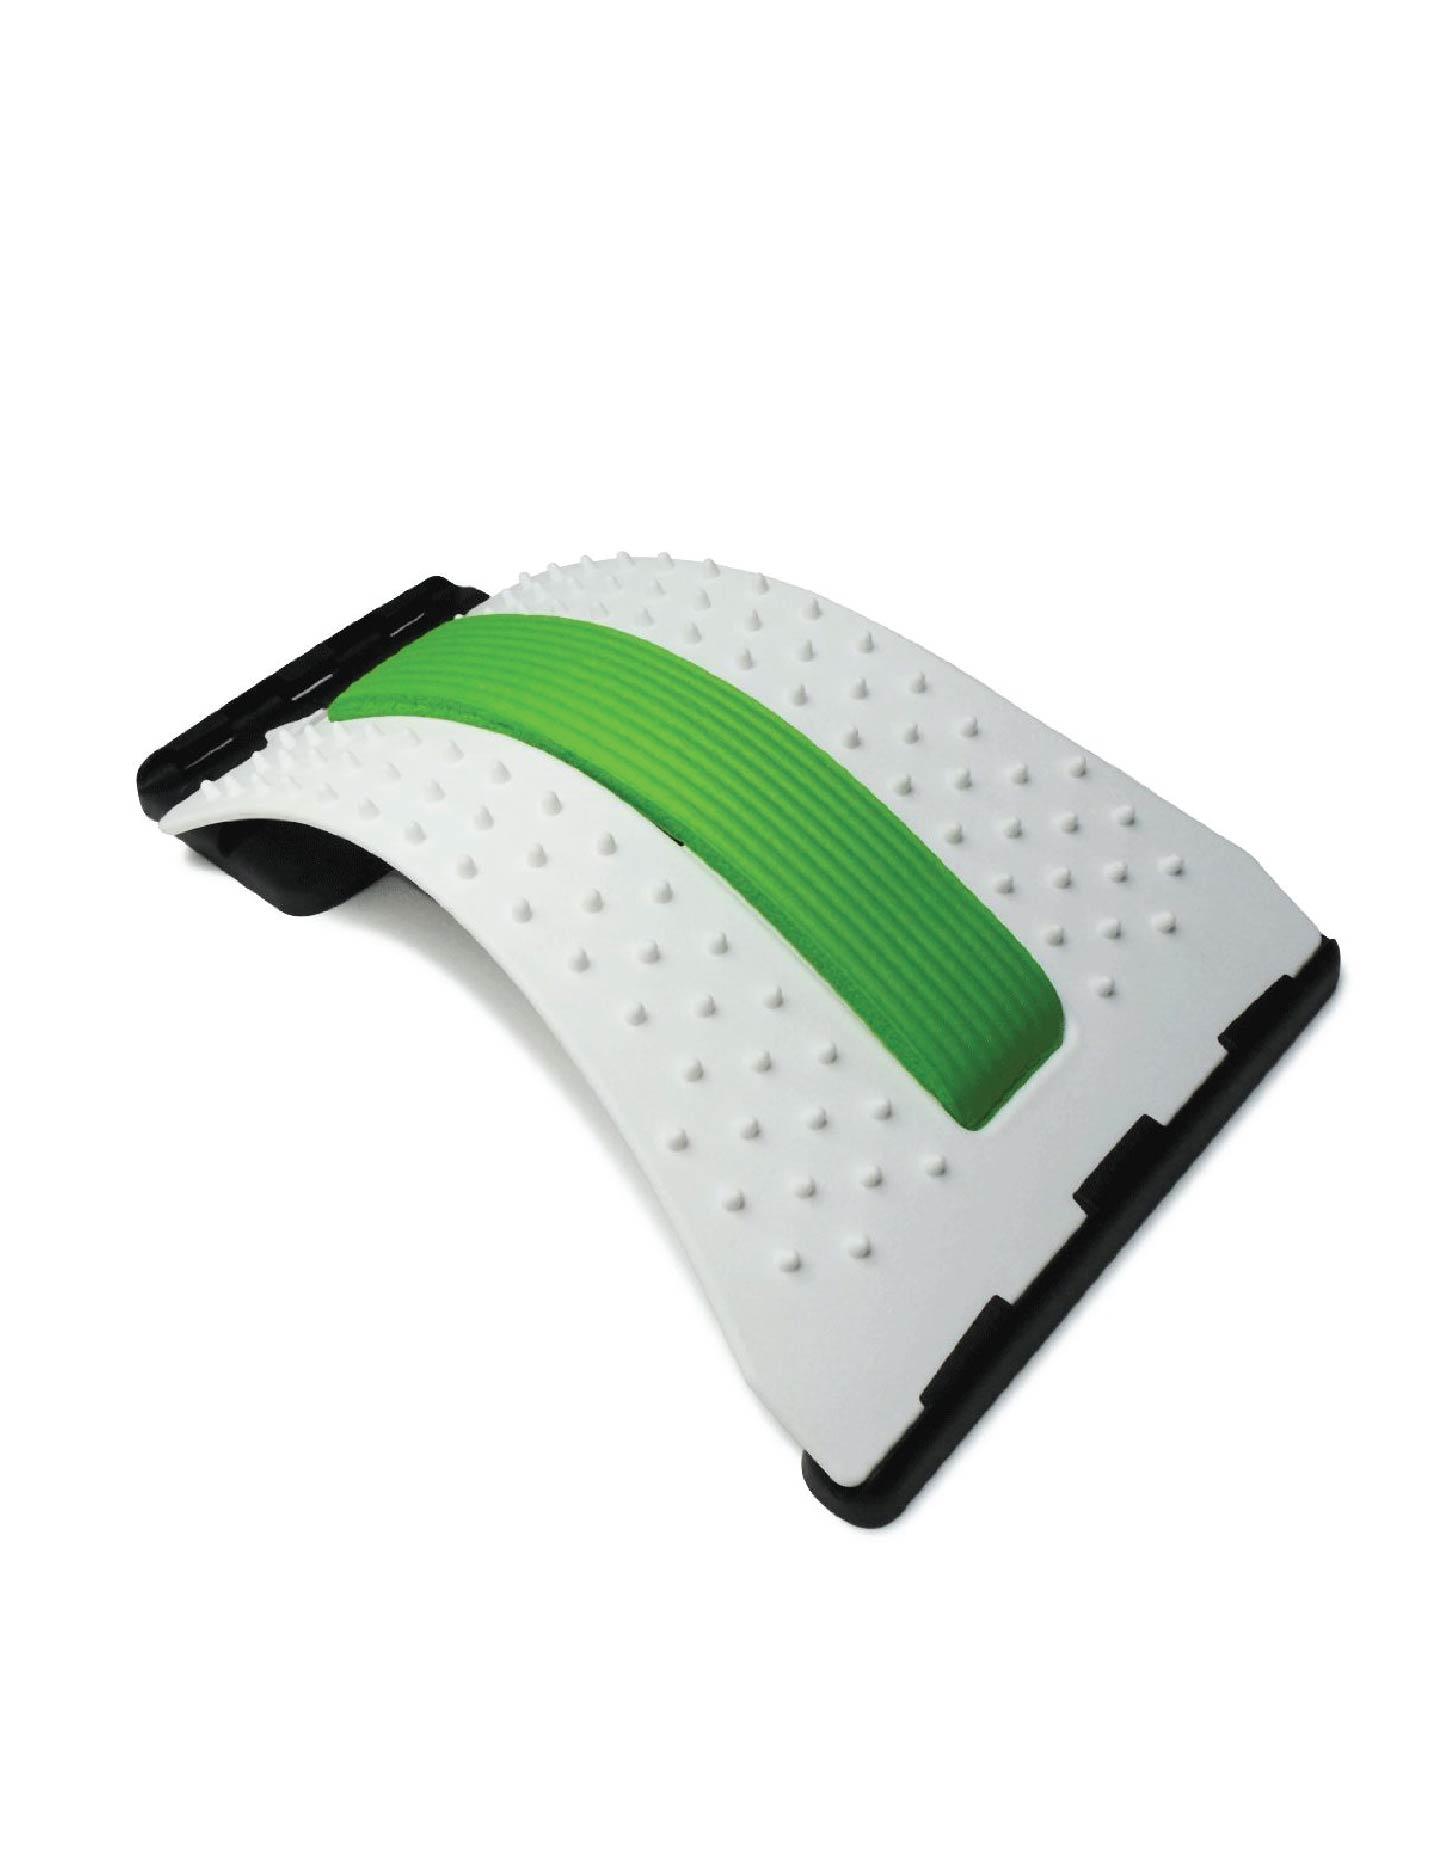 Multi Level Back Stretcher Stayfithk